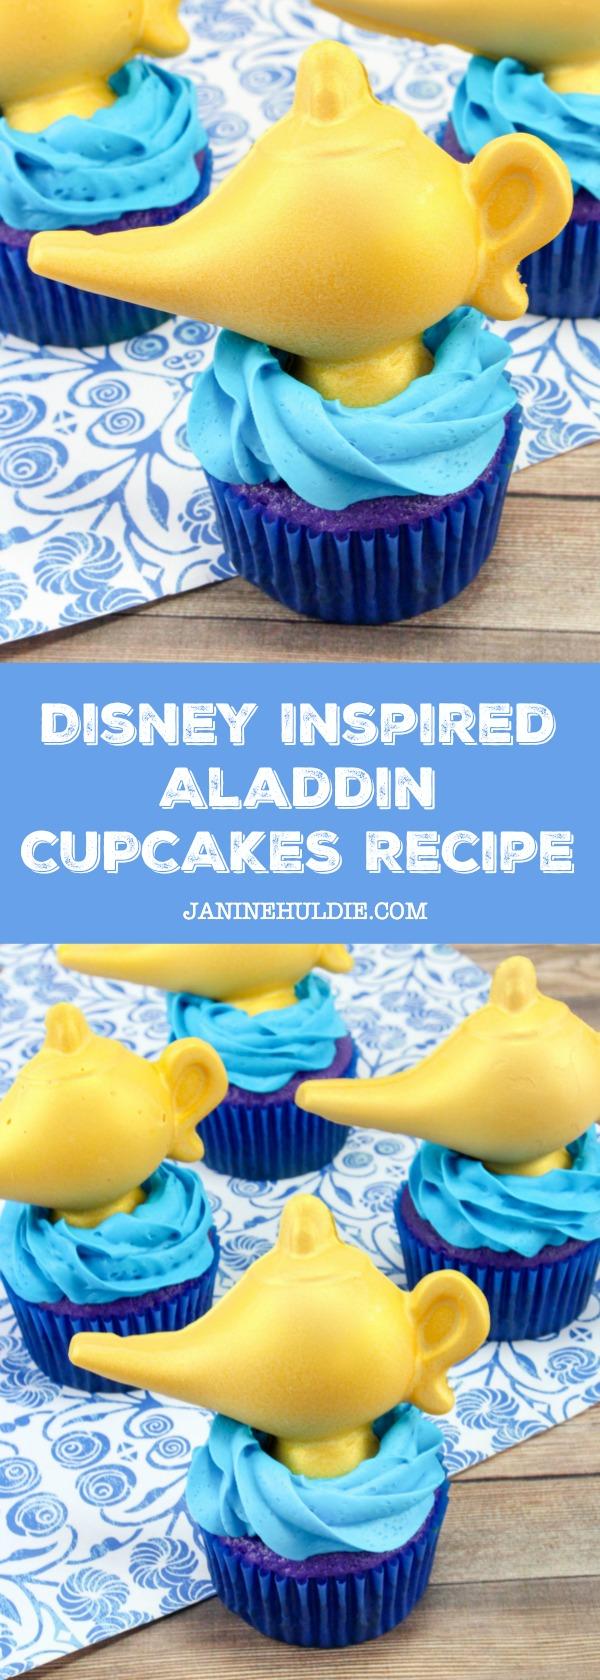 Disney Inspired Aladdin Cupcakes Recipe